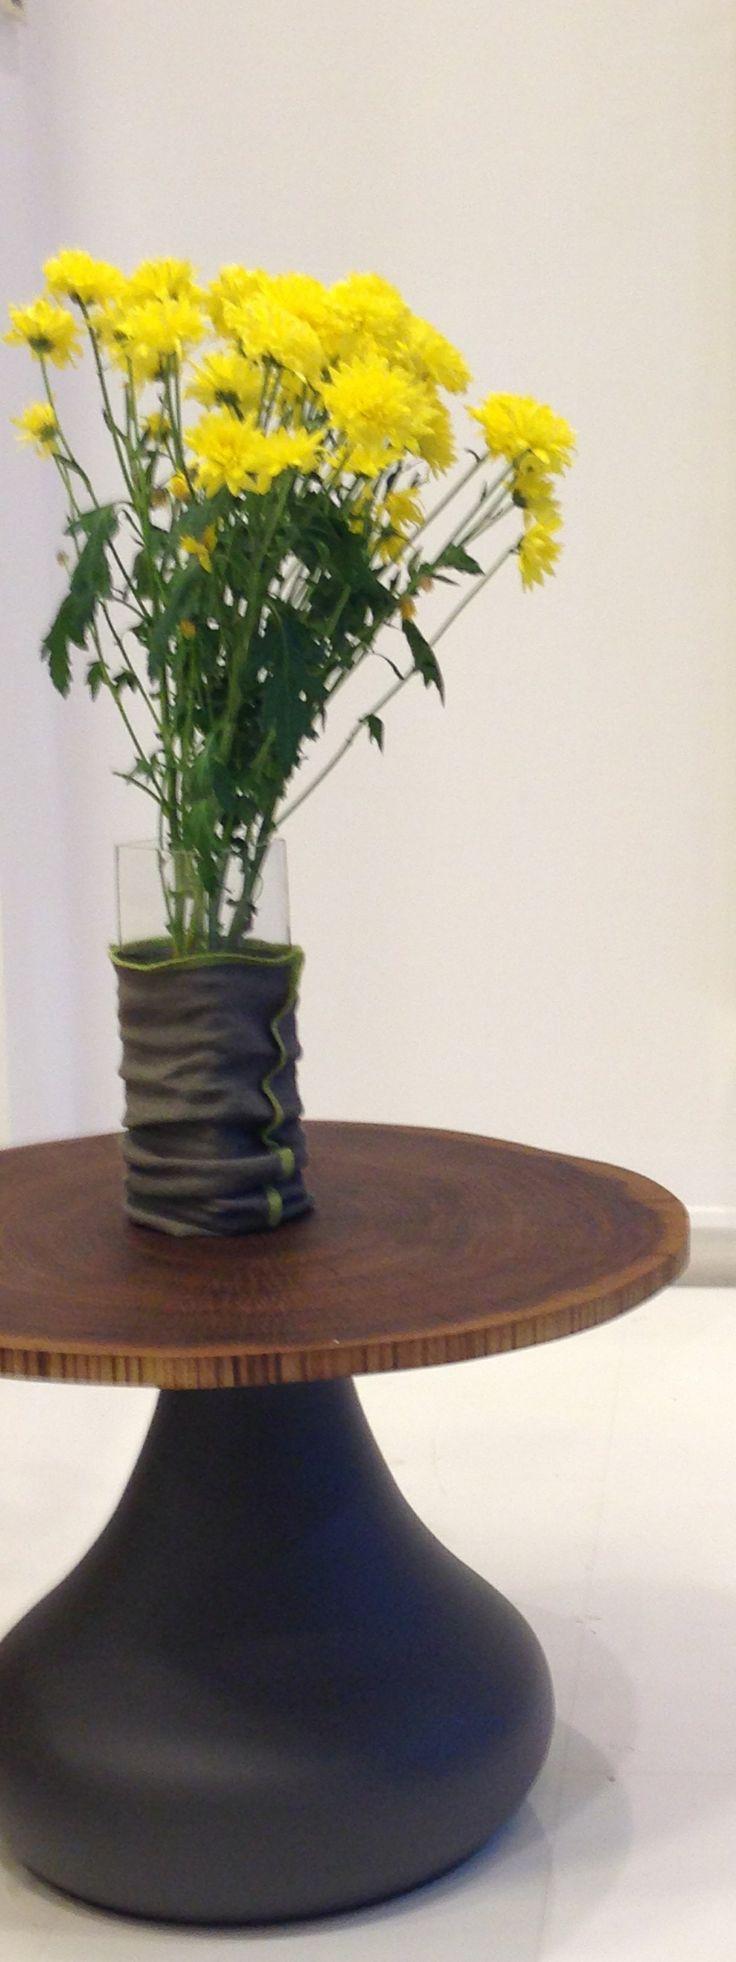 Side table Rio της Cattelan - Casa Di Patsi - Έπιπλα και Ιδέες Διακόσμησης - Home Design | ΕΠΙΠΛΑ